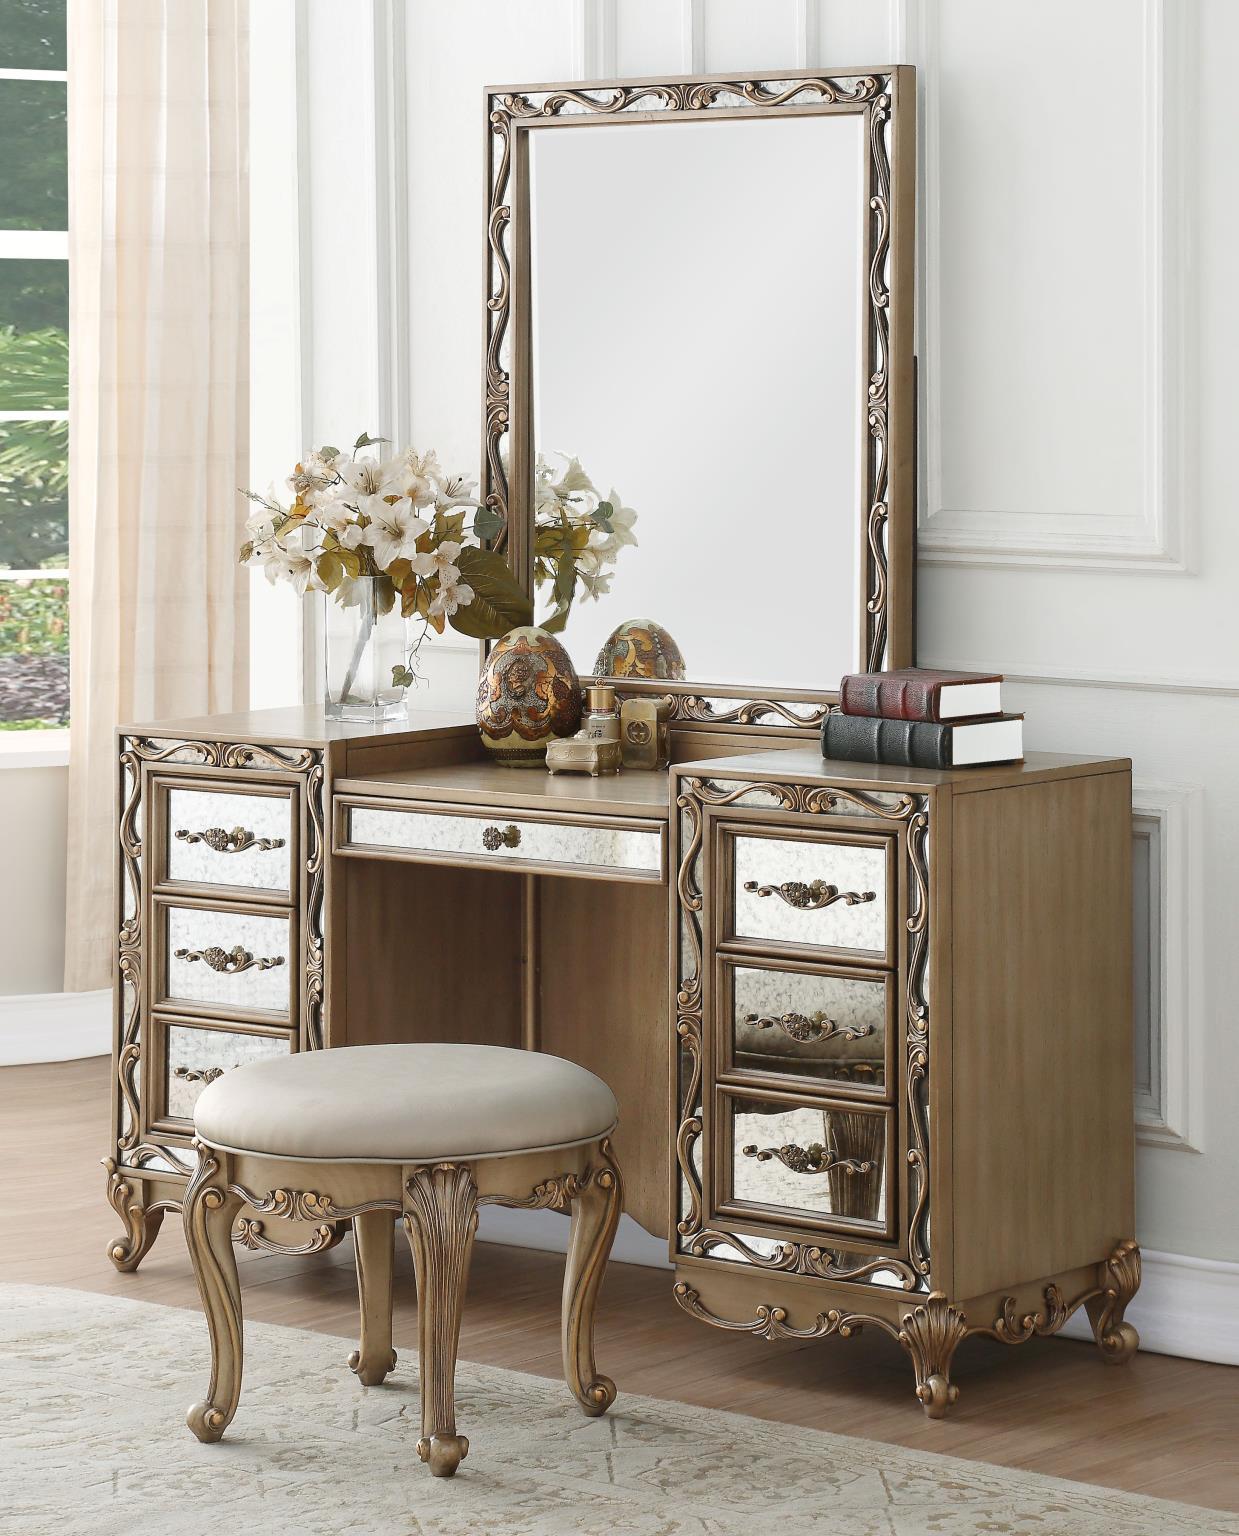 Orianne Antique Gold Vanity Desk